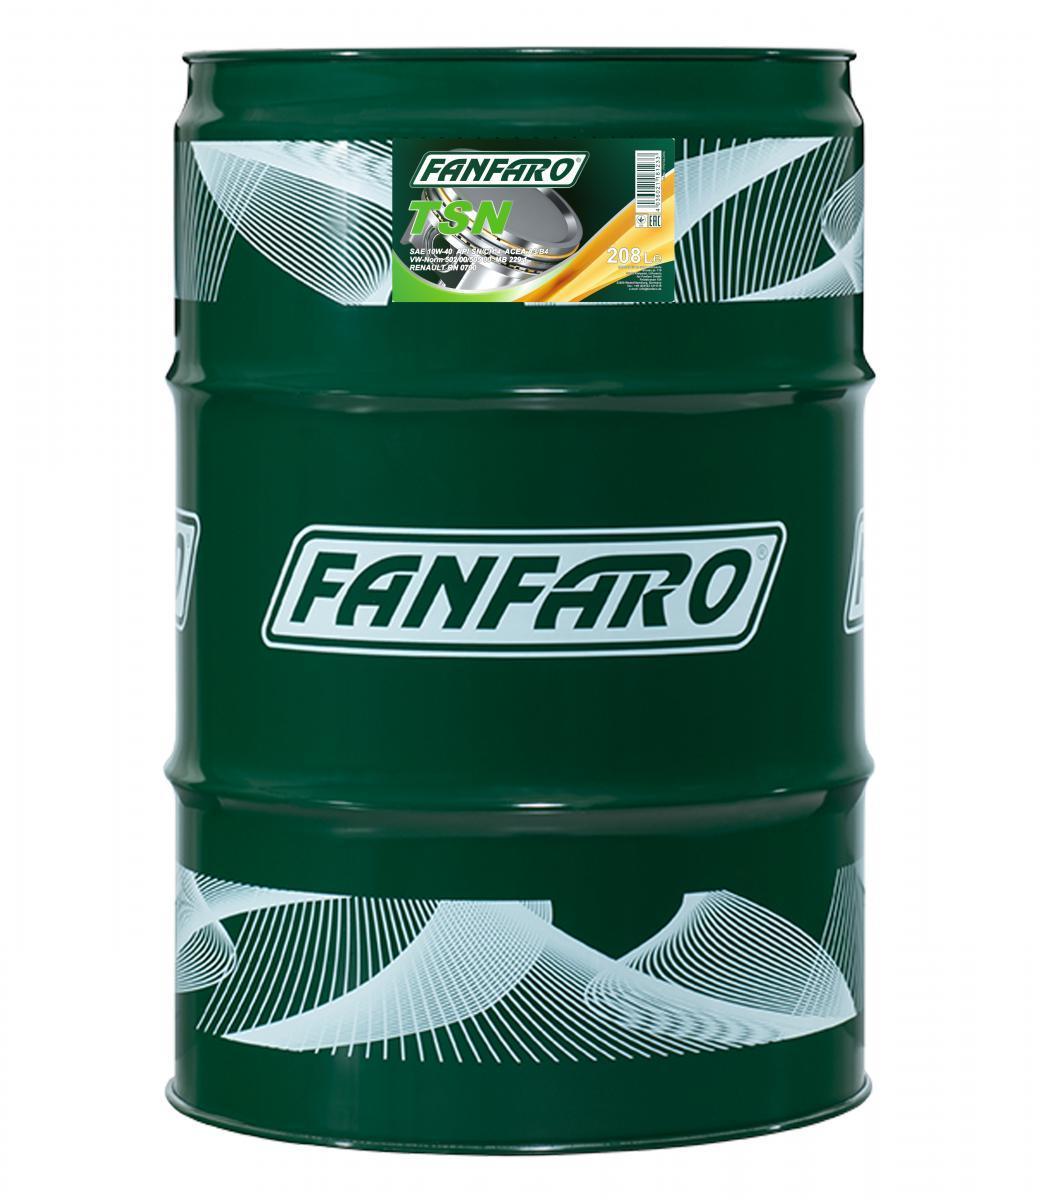 FF6704-DR FANFARO Profi Line, TSN 10W-40, 208l, Synthetiköl Motoröl FF6704-DR günstig kaufen